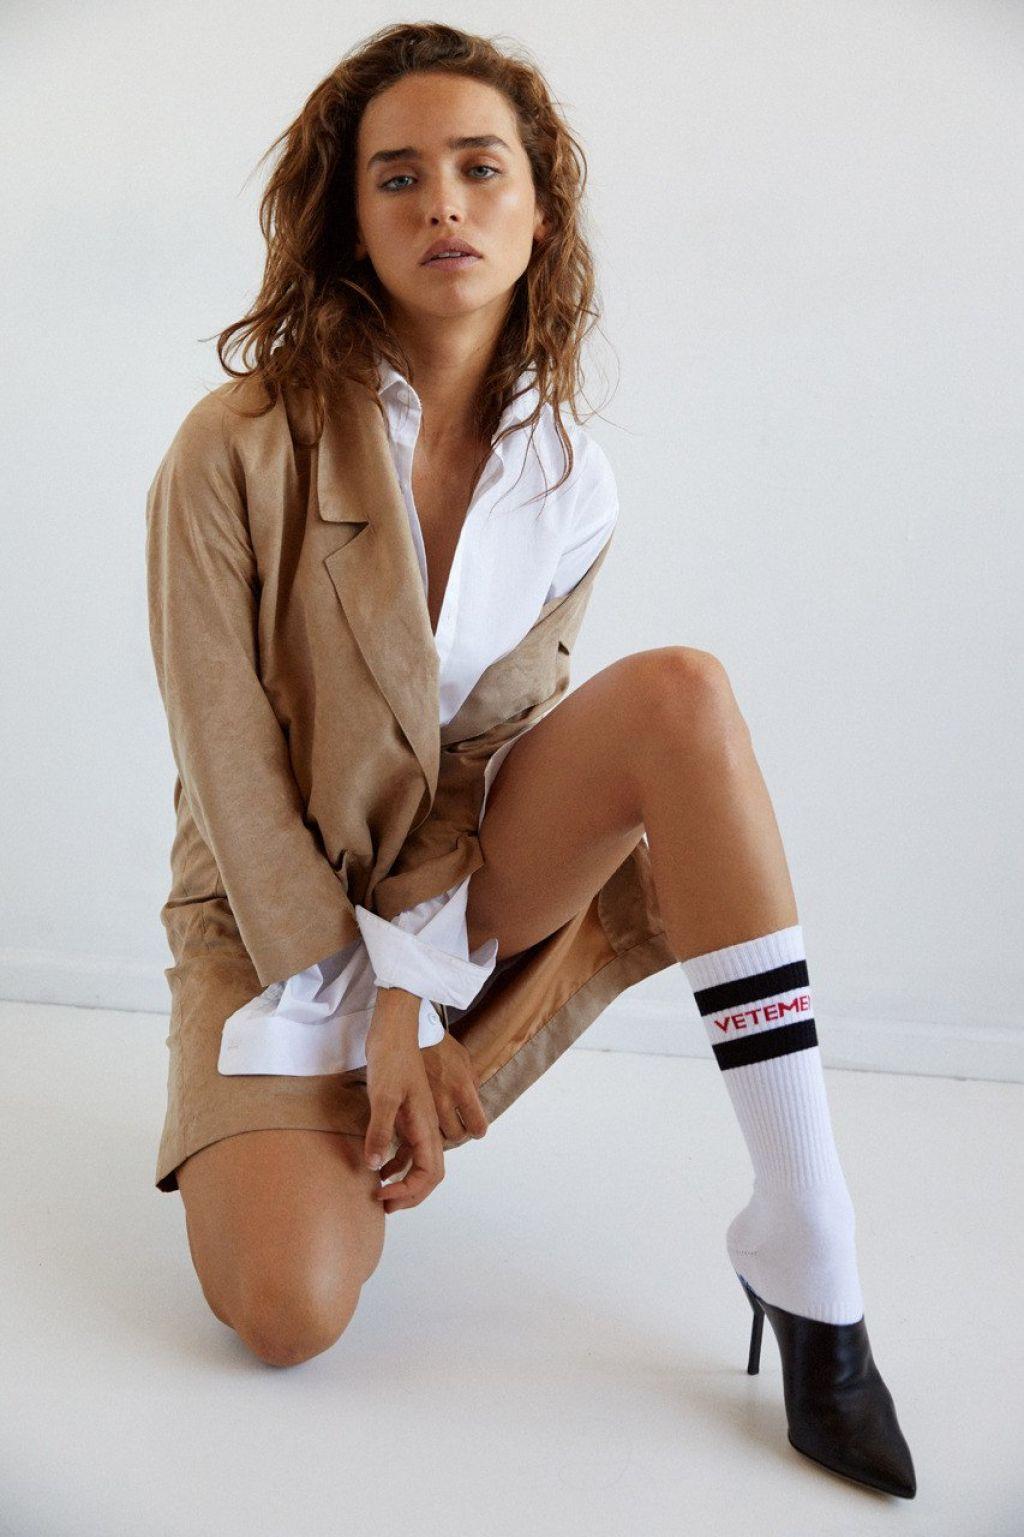 Carolina Sanchez nudes (64 fotos) Gallery, Twitter, braless